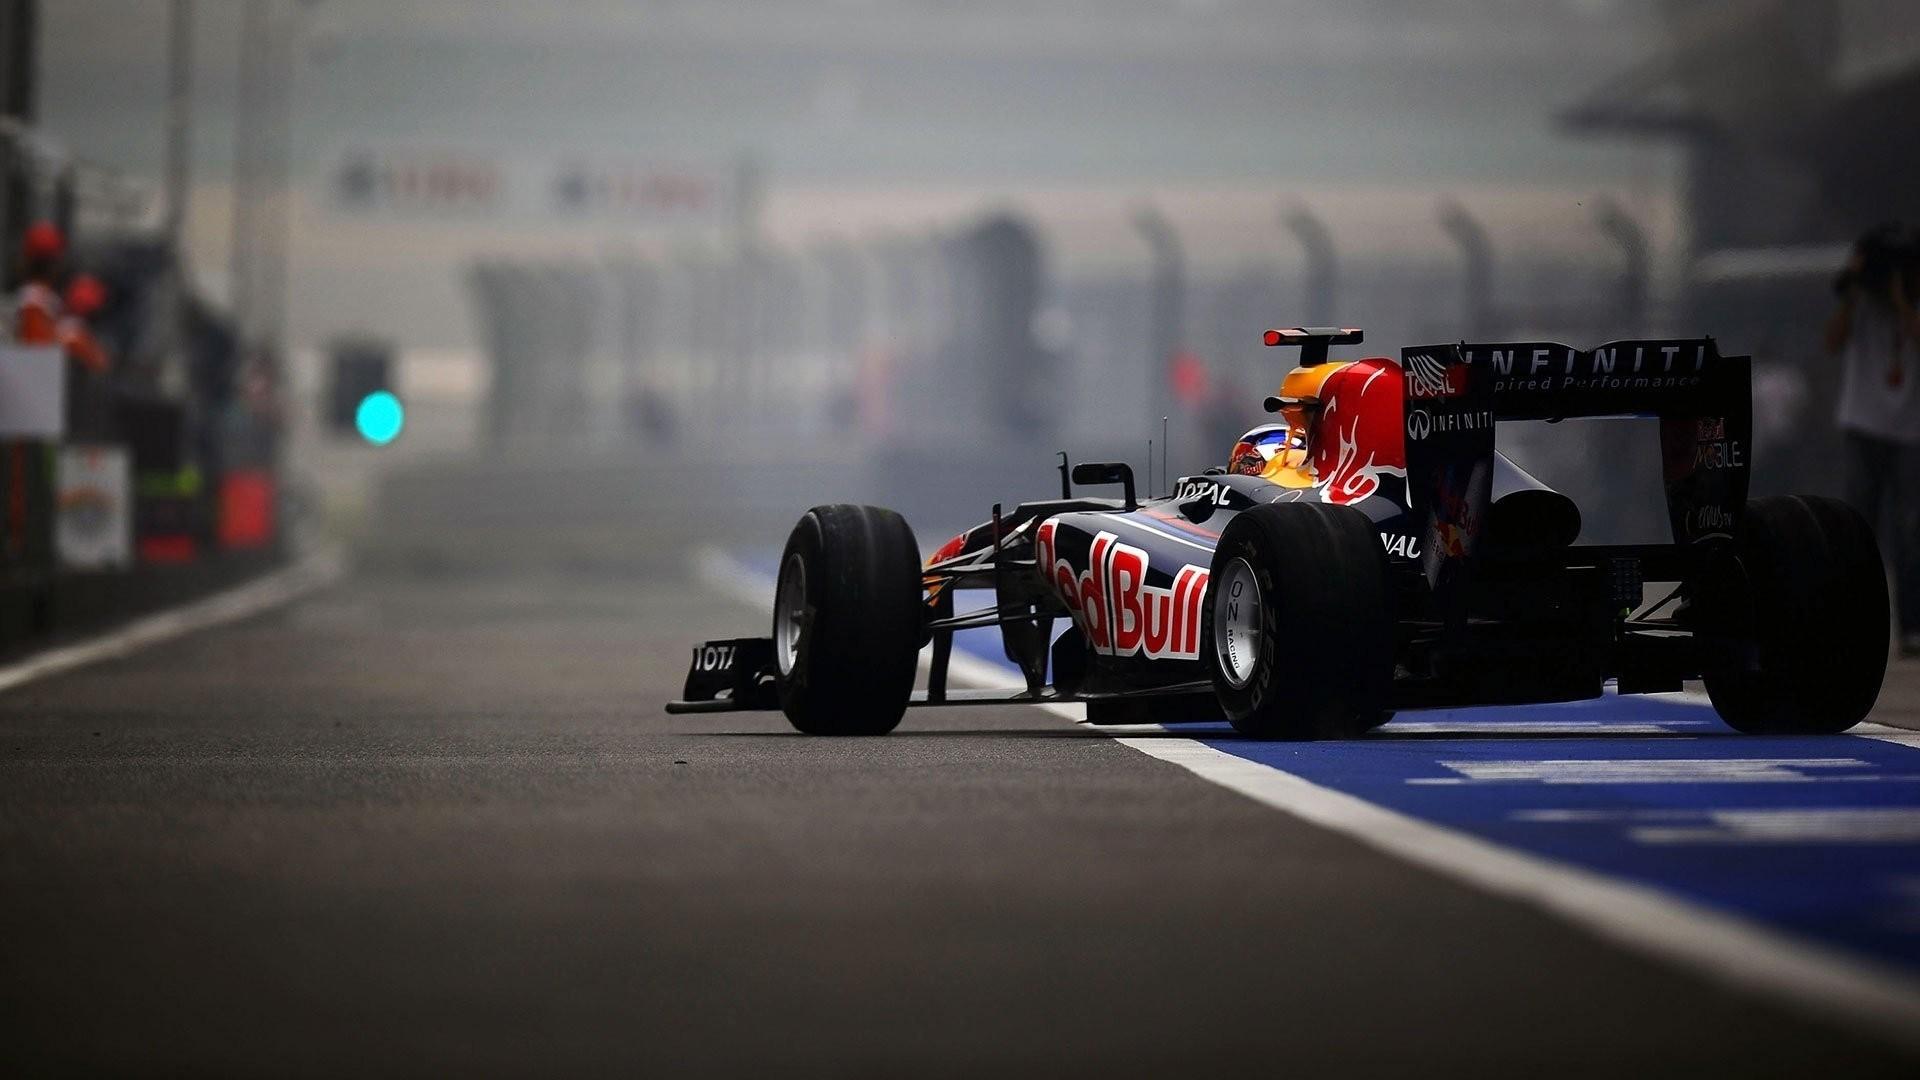 Formula 1 Desktop wallpaper